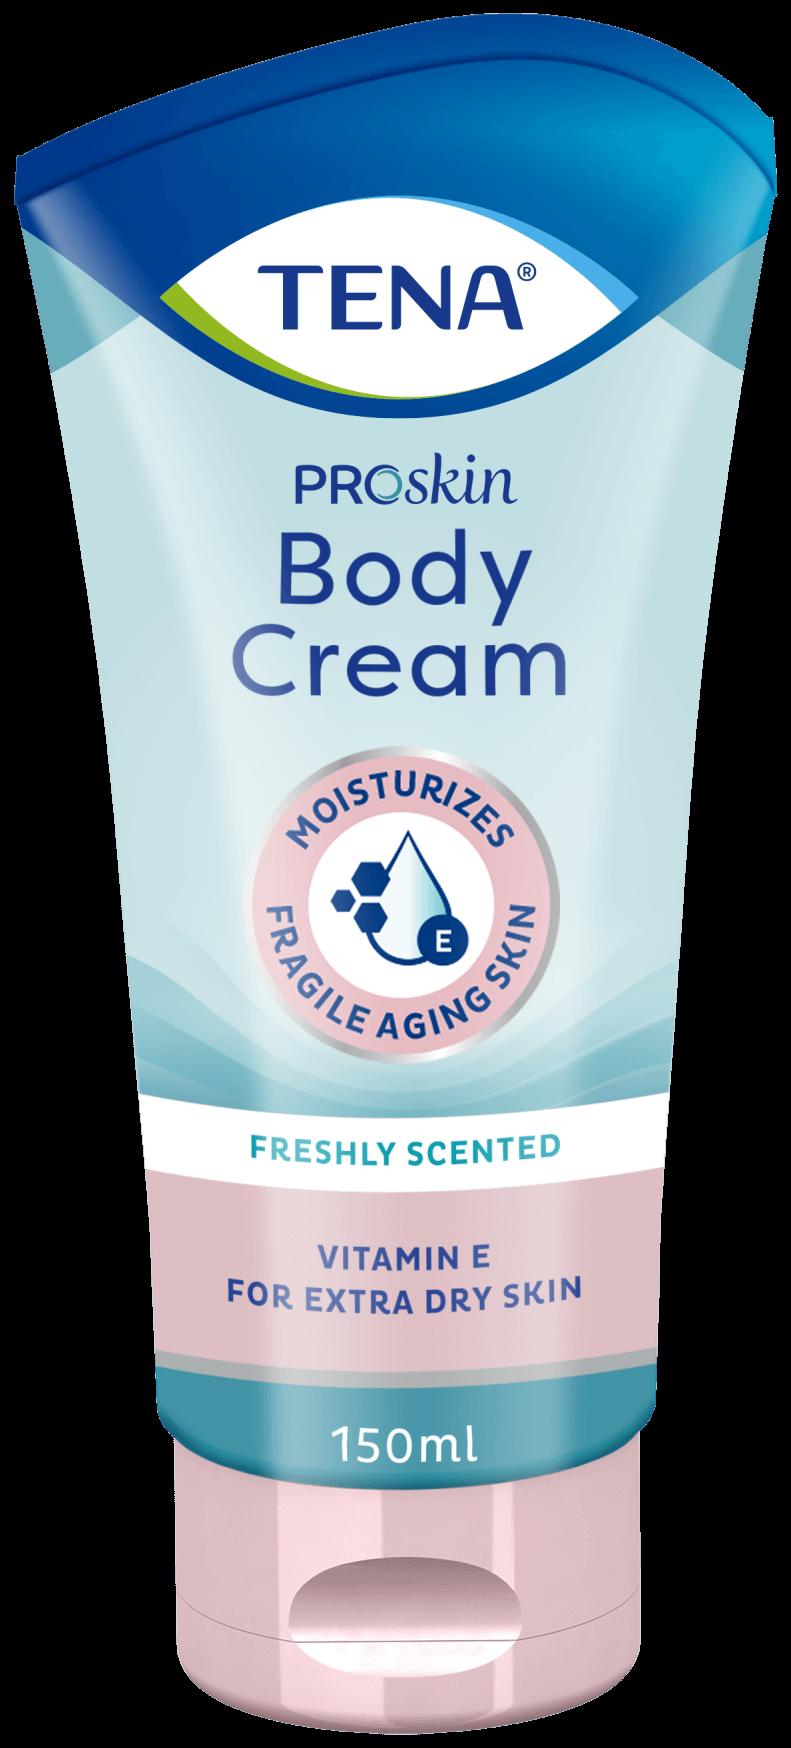 TENA ProSkin Body Cream